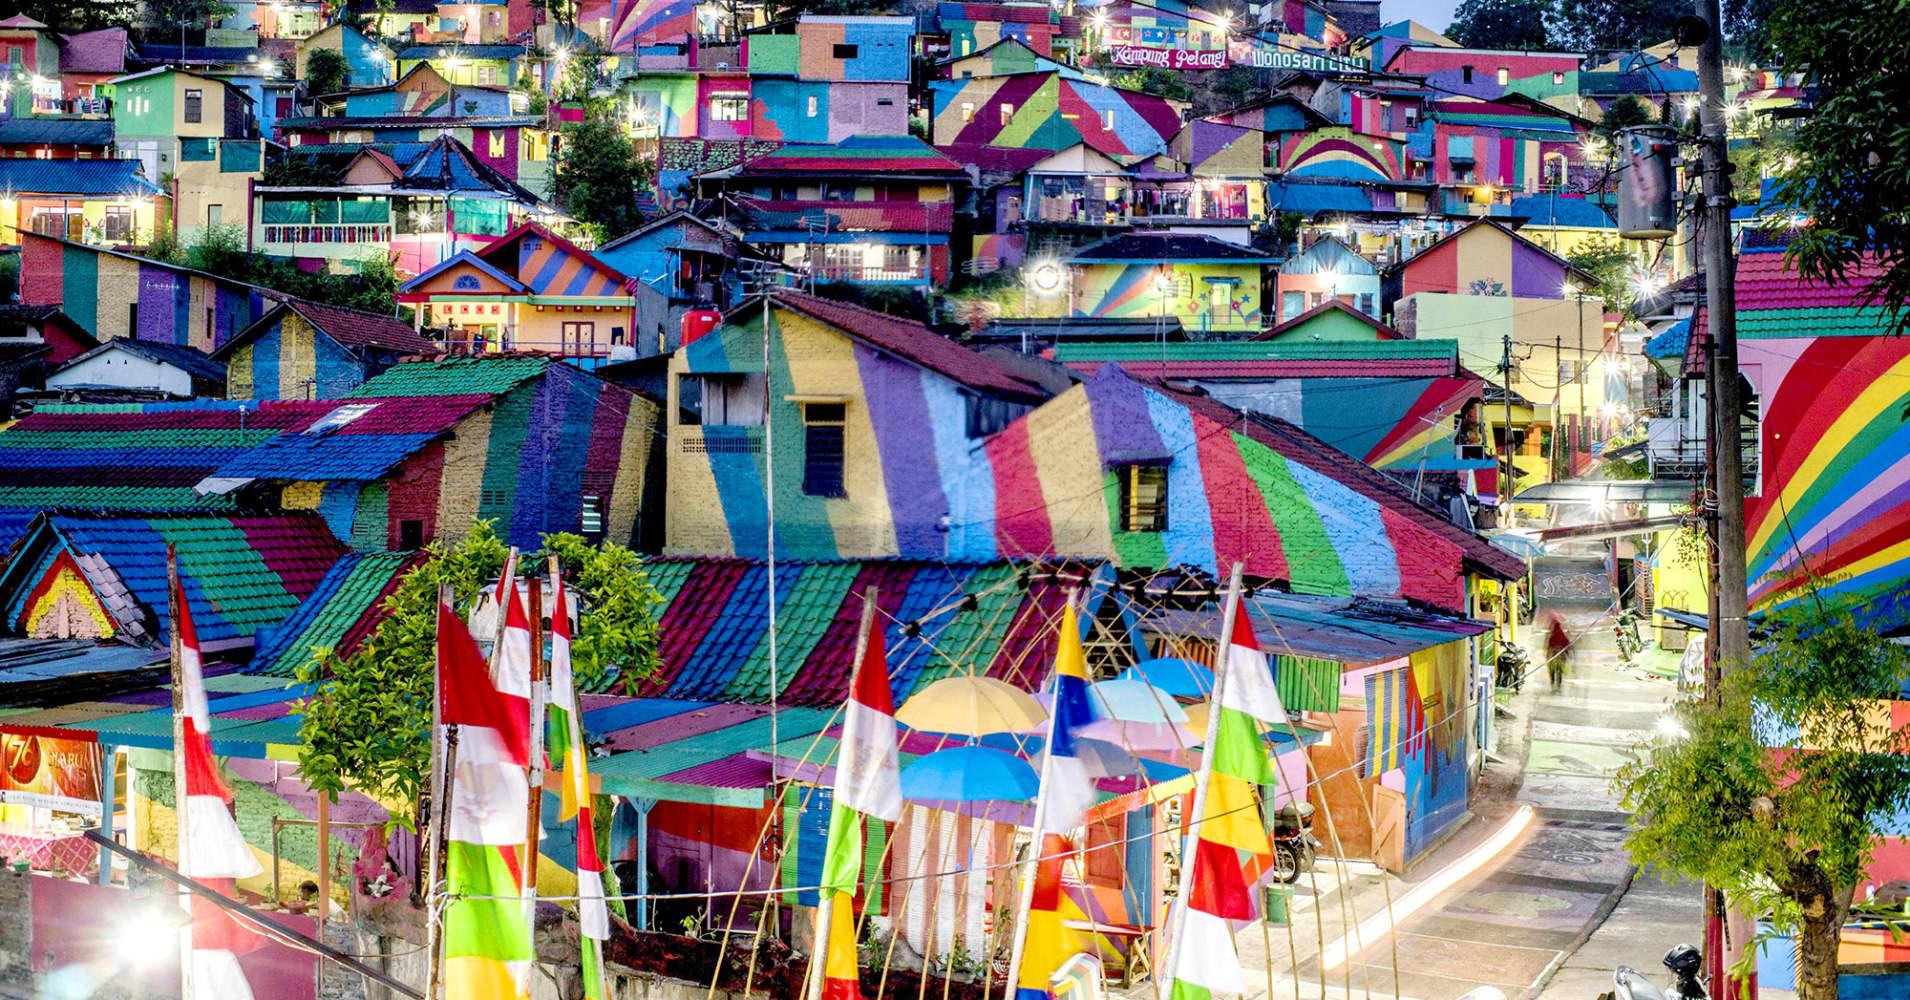 residents transform slum to rainbow village tourist mecca